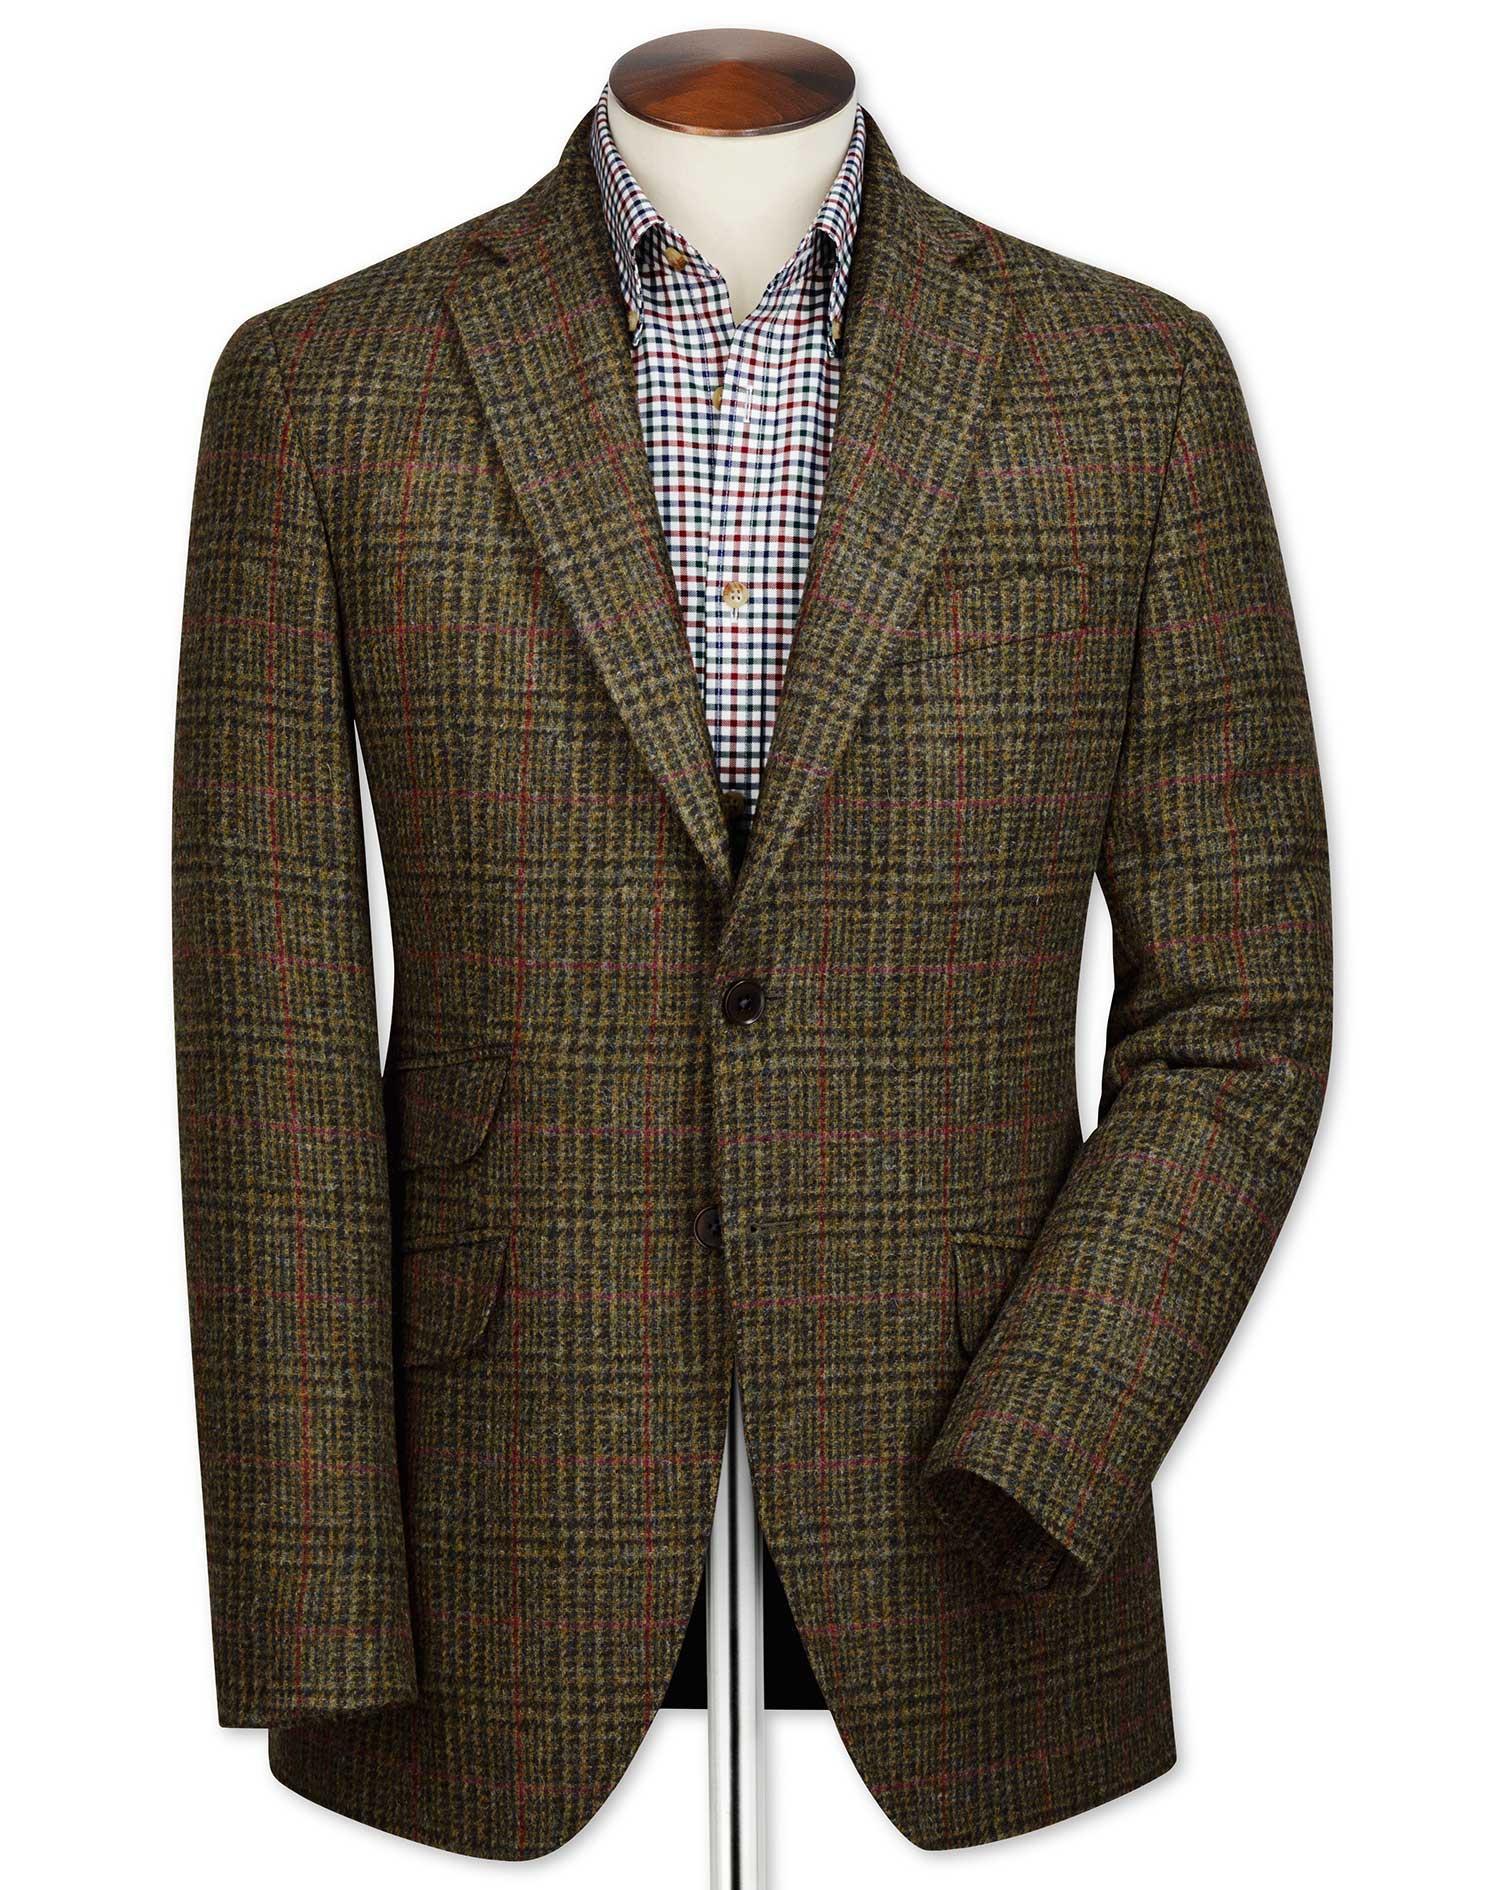 Slim Fit Green Checkered British Tweed Wool Jacket Size 38 Long by Charles Tyrwhitt